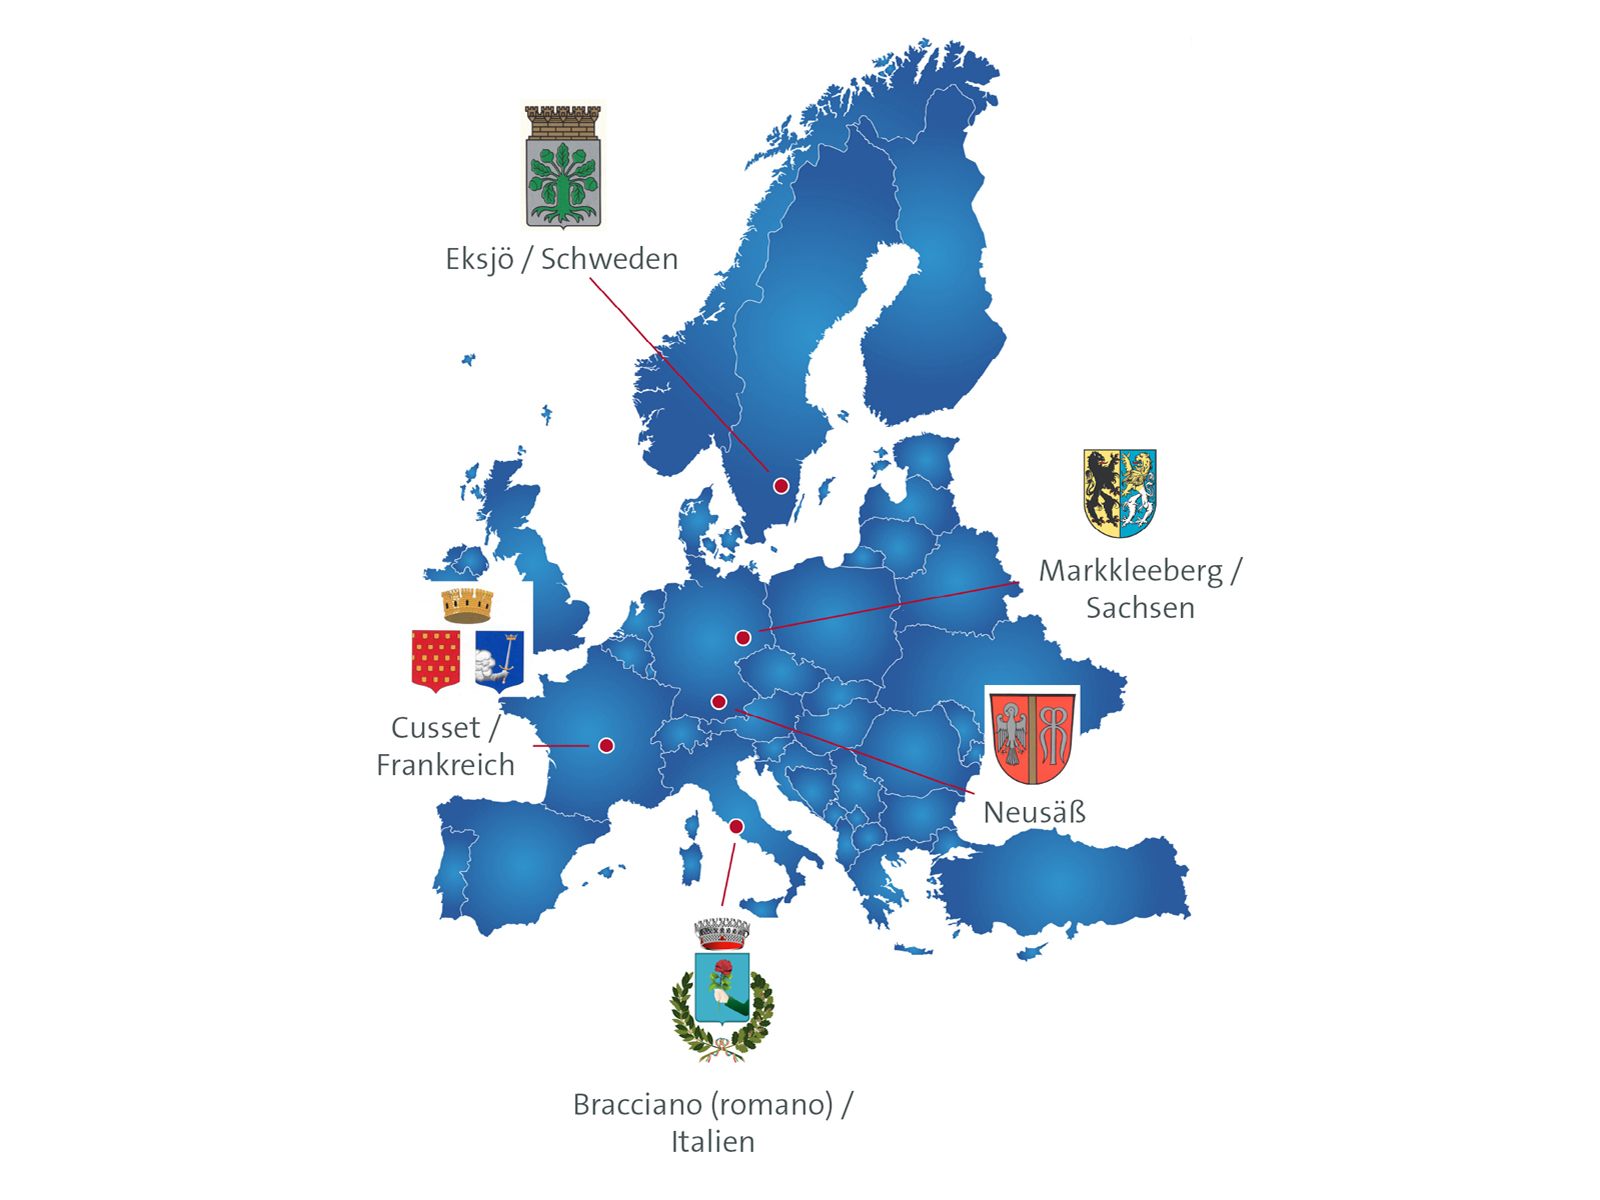 Lage der Partnerstädte in Europa. Europakarte: fotolia.com, white